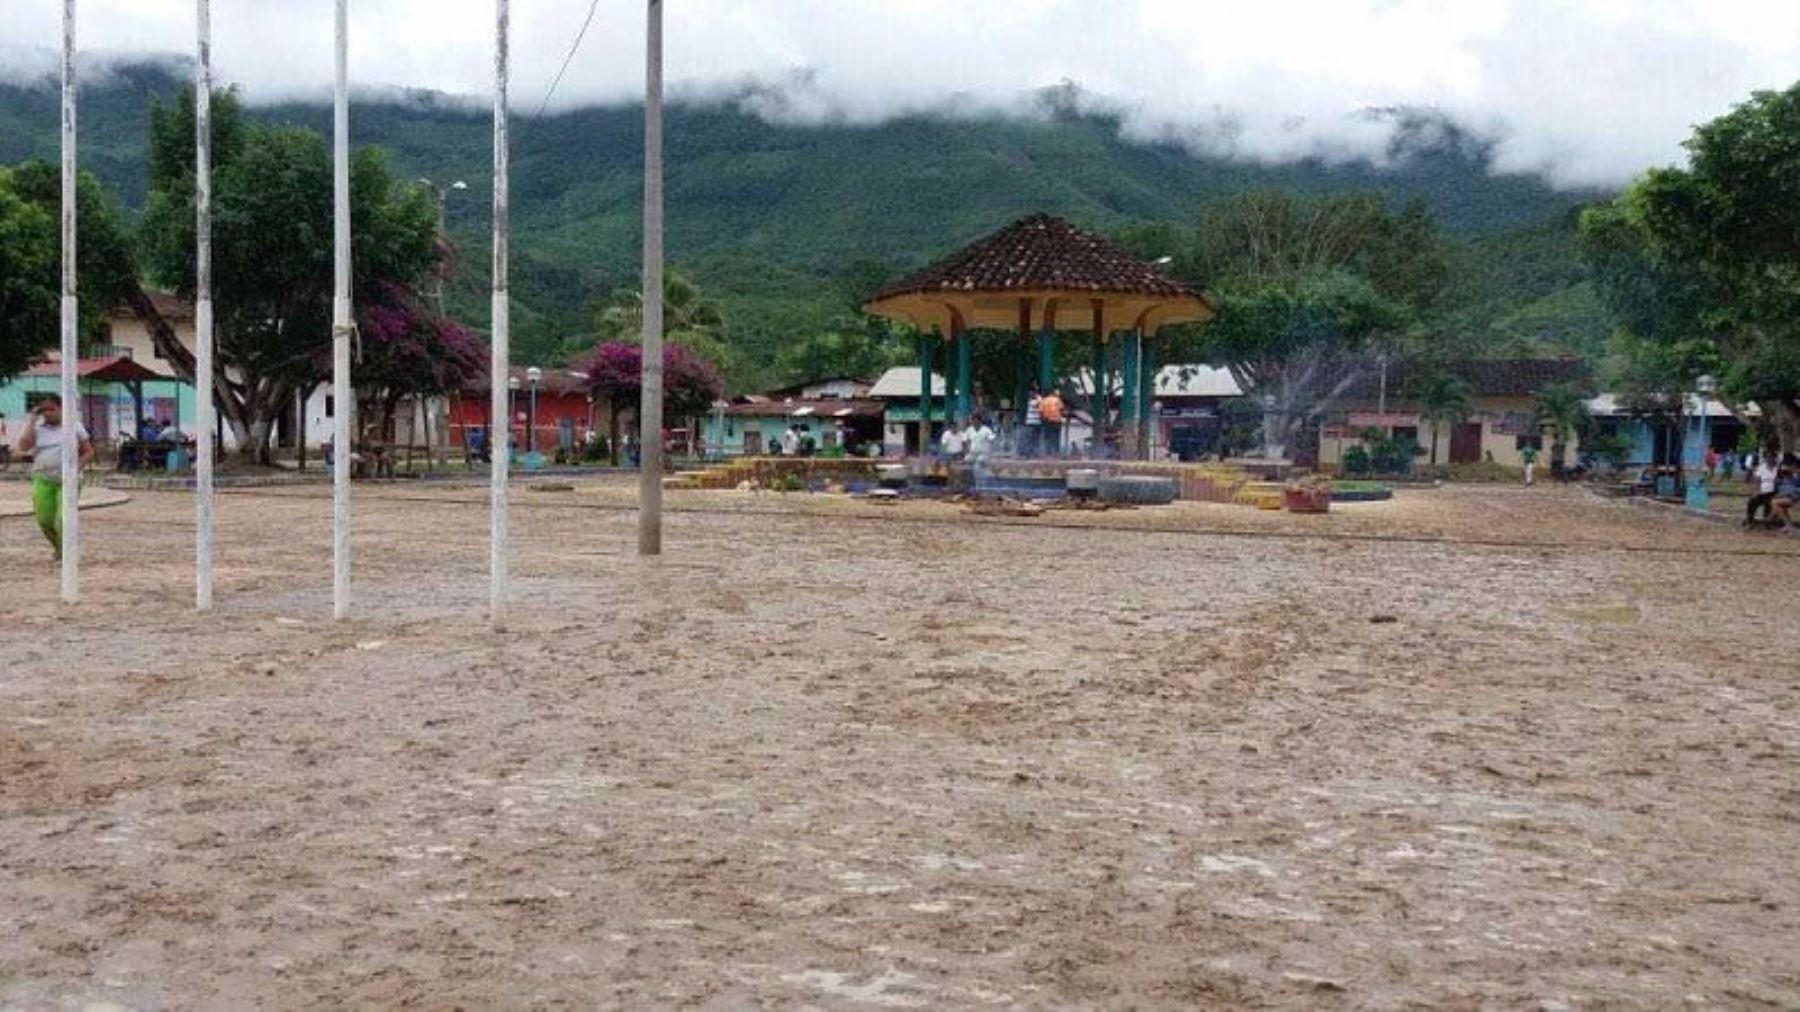 Totalmente inundada se encuentra la plaza de Shamboyacu, en Picota. Foto: Captura TV.